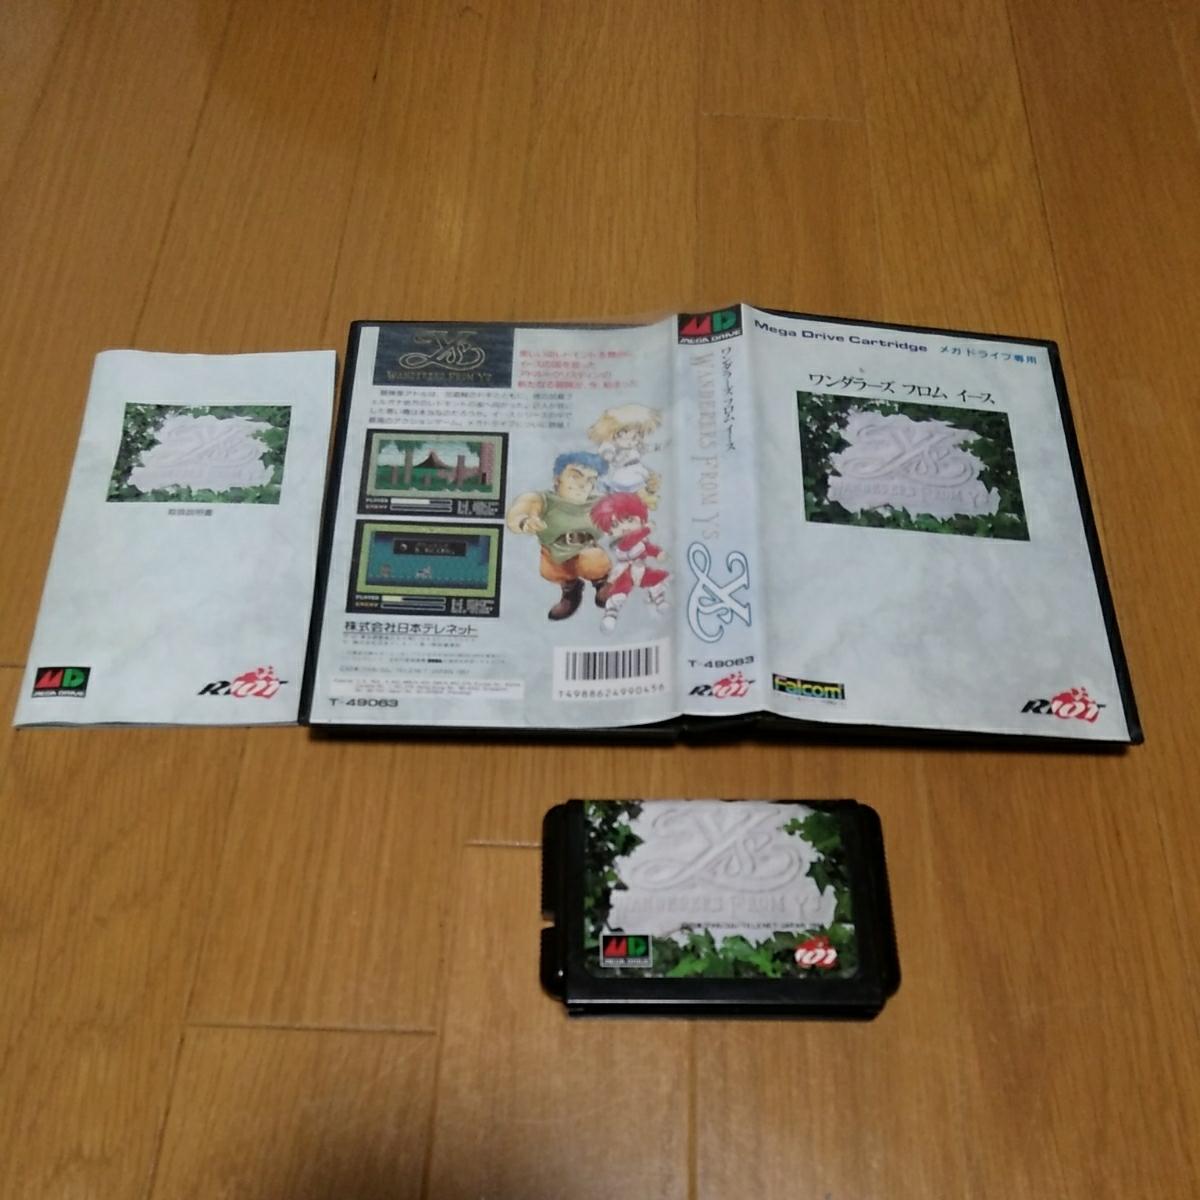 Mega Drive soft one dala-zf rom e-s